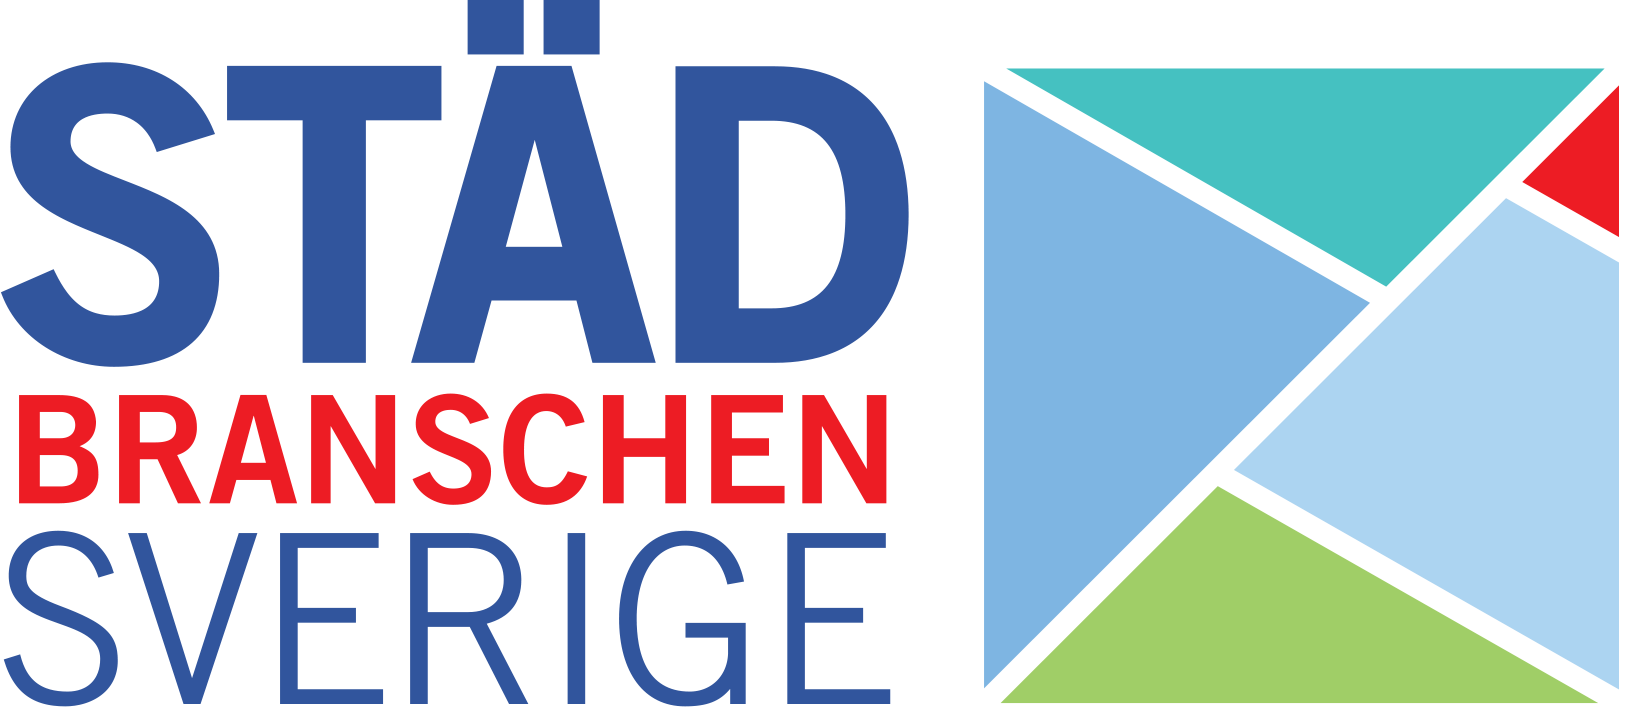 164 Stadbranschensverige logo